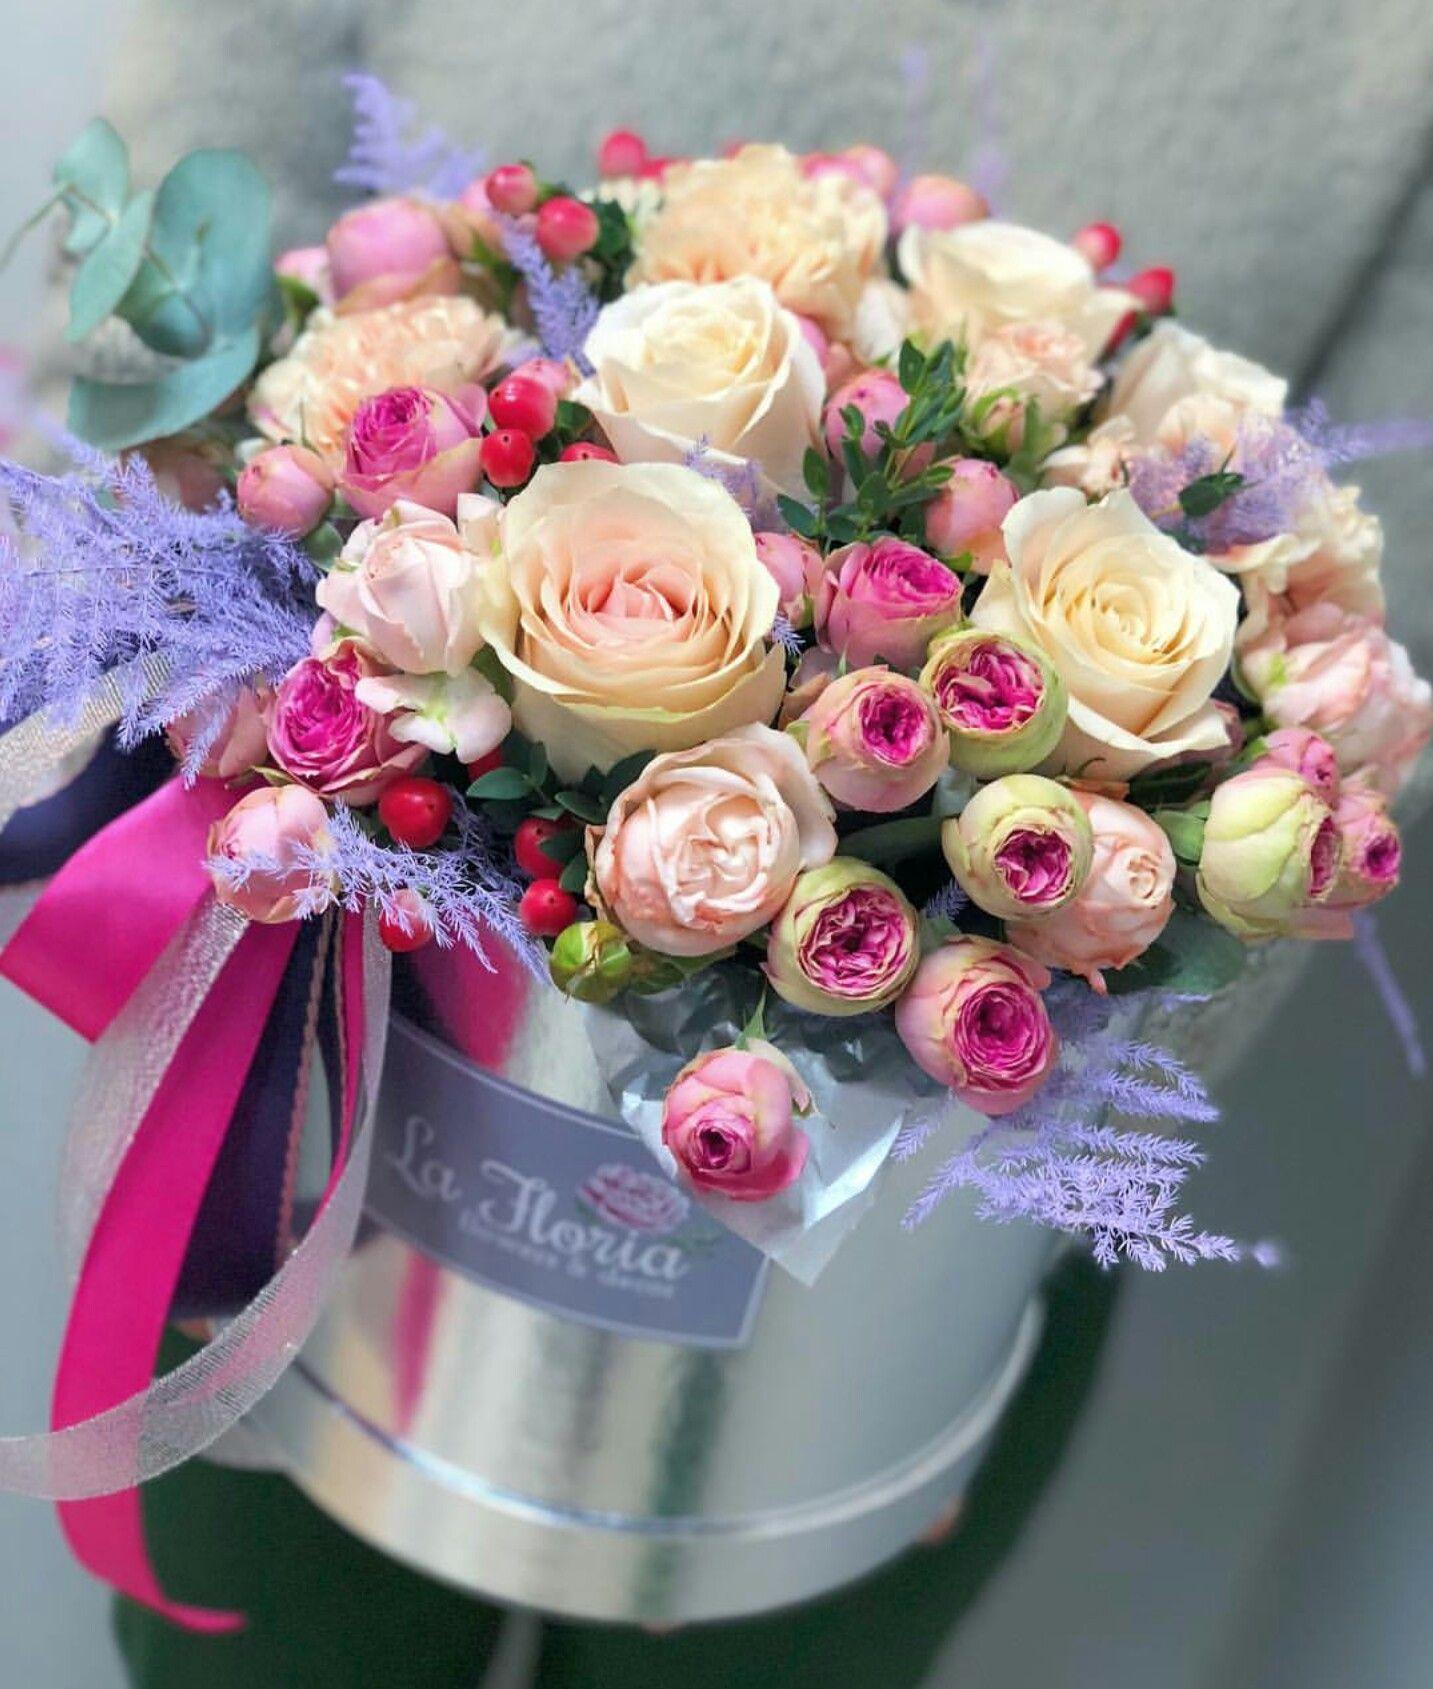 Pin By Ann Oosthuizen On Flowers Flowers Flower Boutique